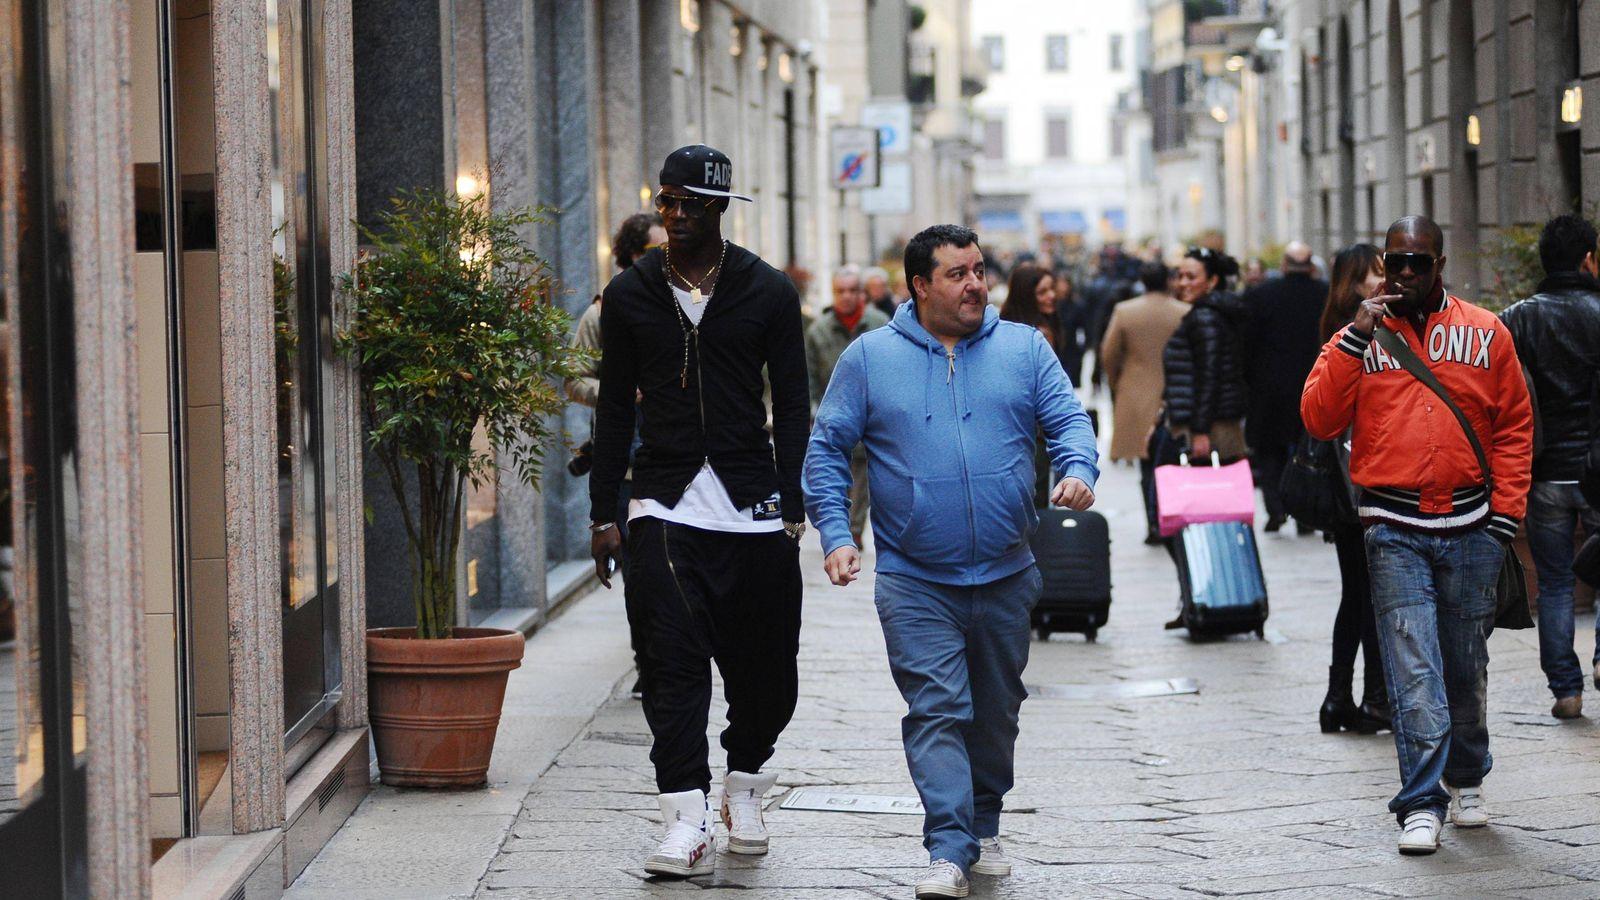 Foto: Mario Balotelli y Mino Raiola paseando por Milán (Cordon Press).